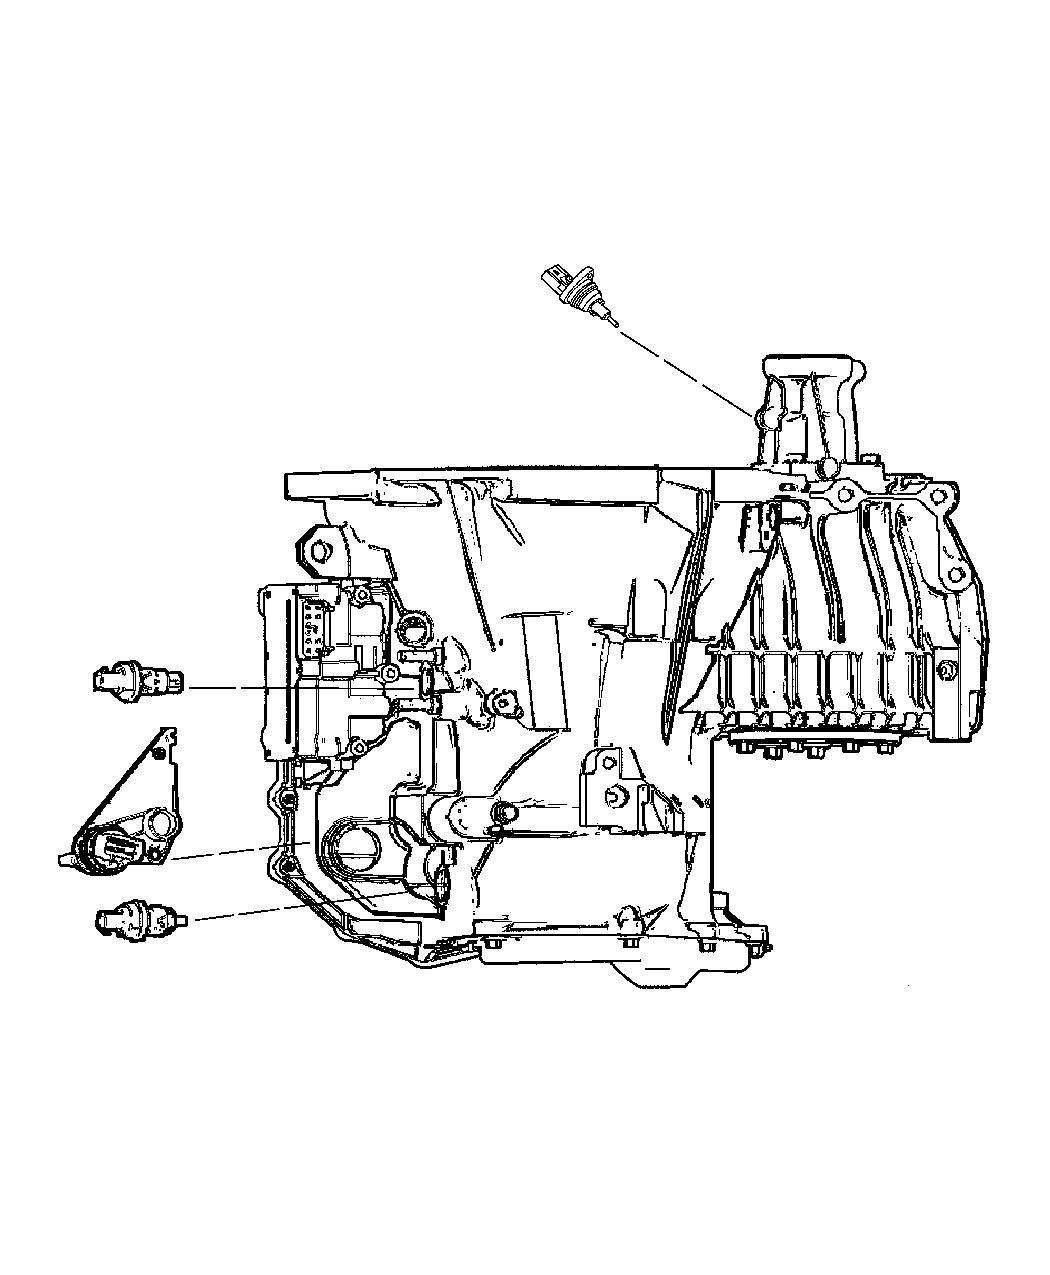 2014 Jeep Patriot Sensor. Primary revolution. Transmission